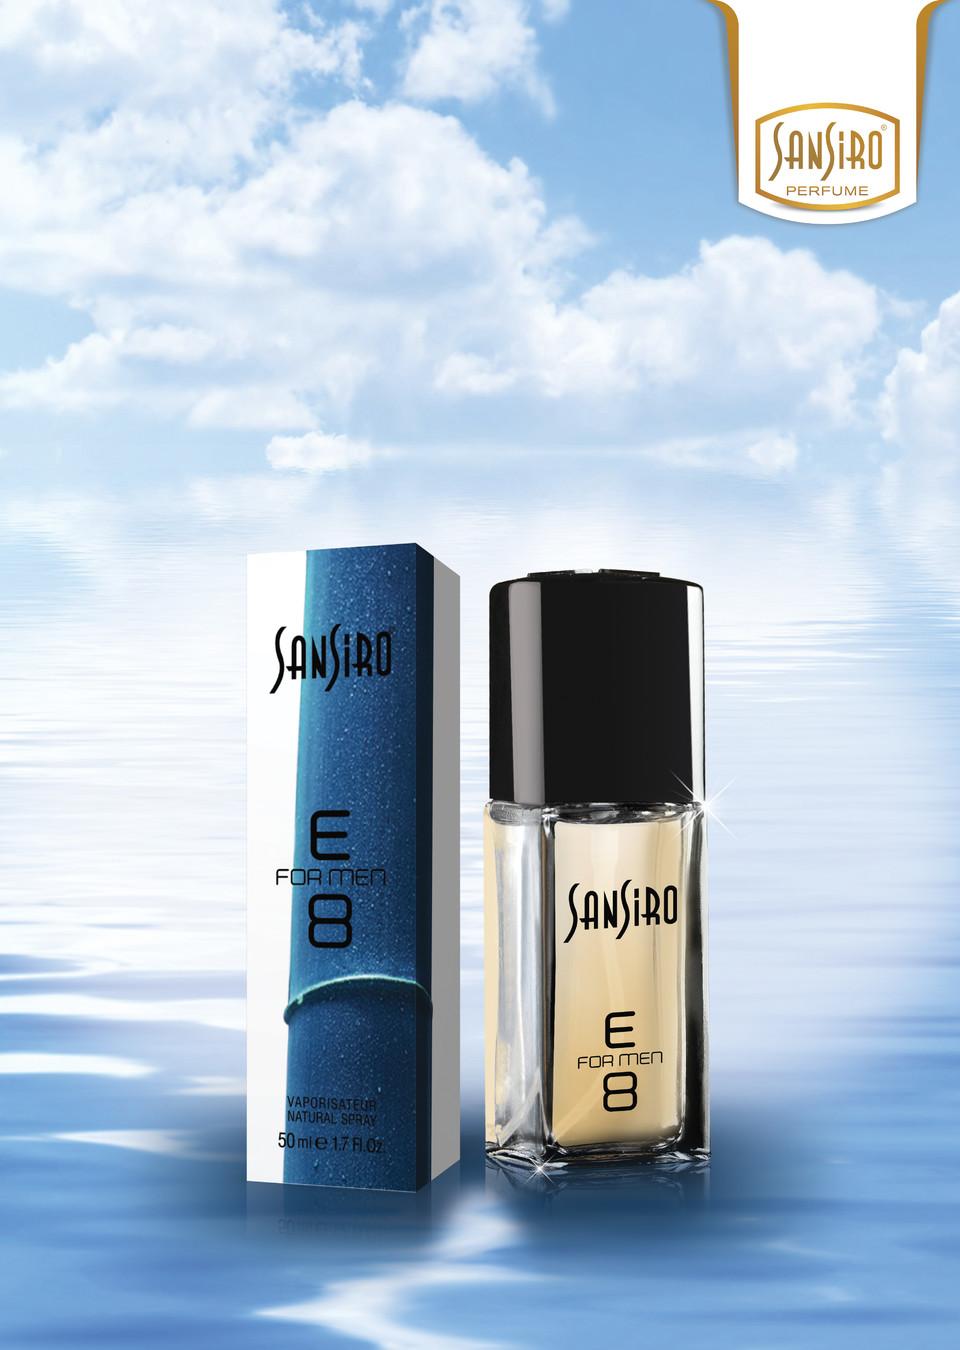 Sansiro Perfume - For Men - Lorenzo (E8)